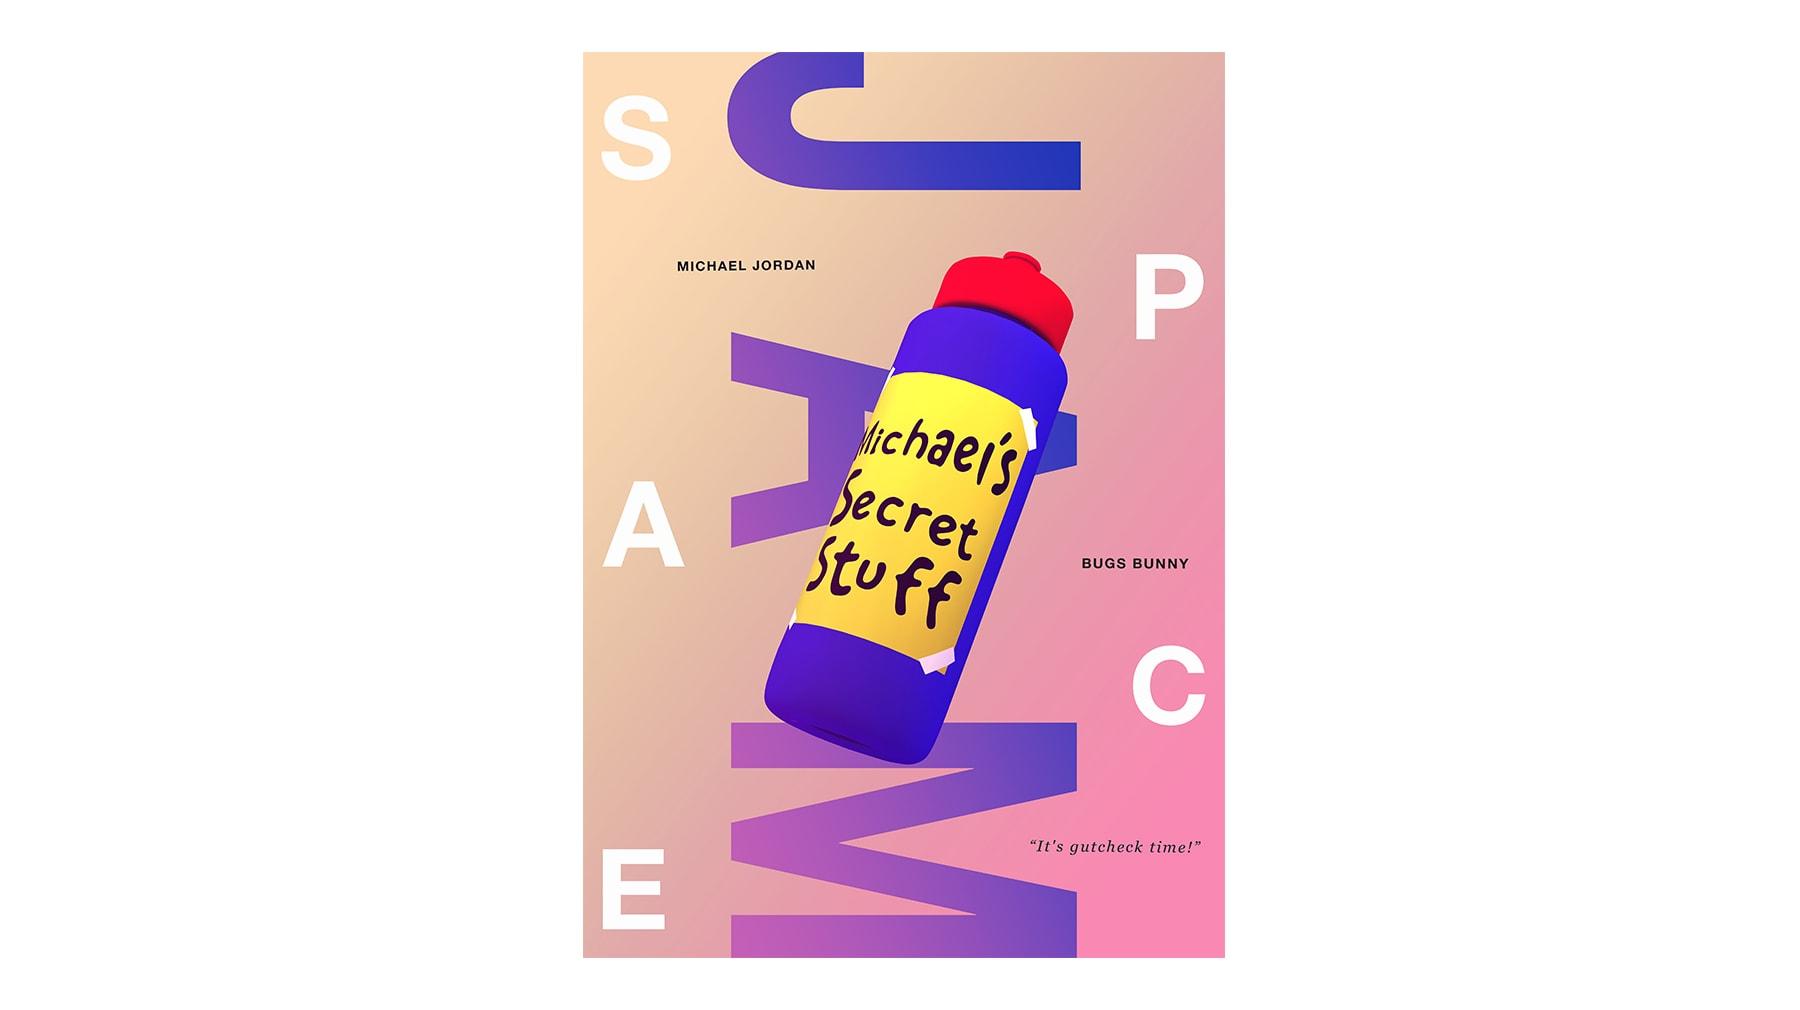 Space_jam